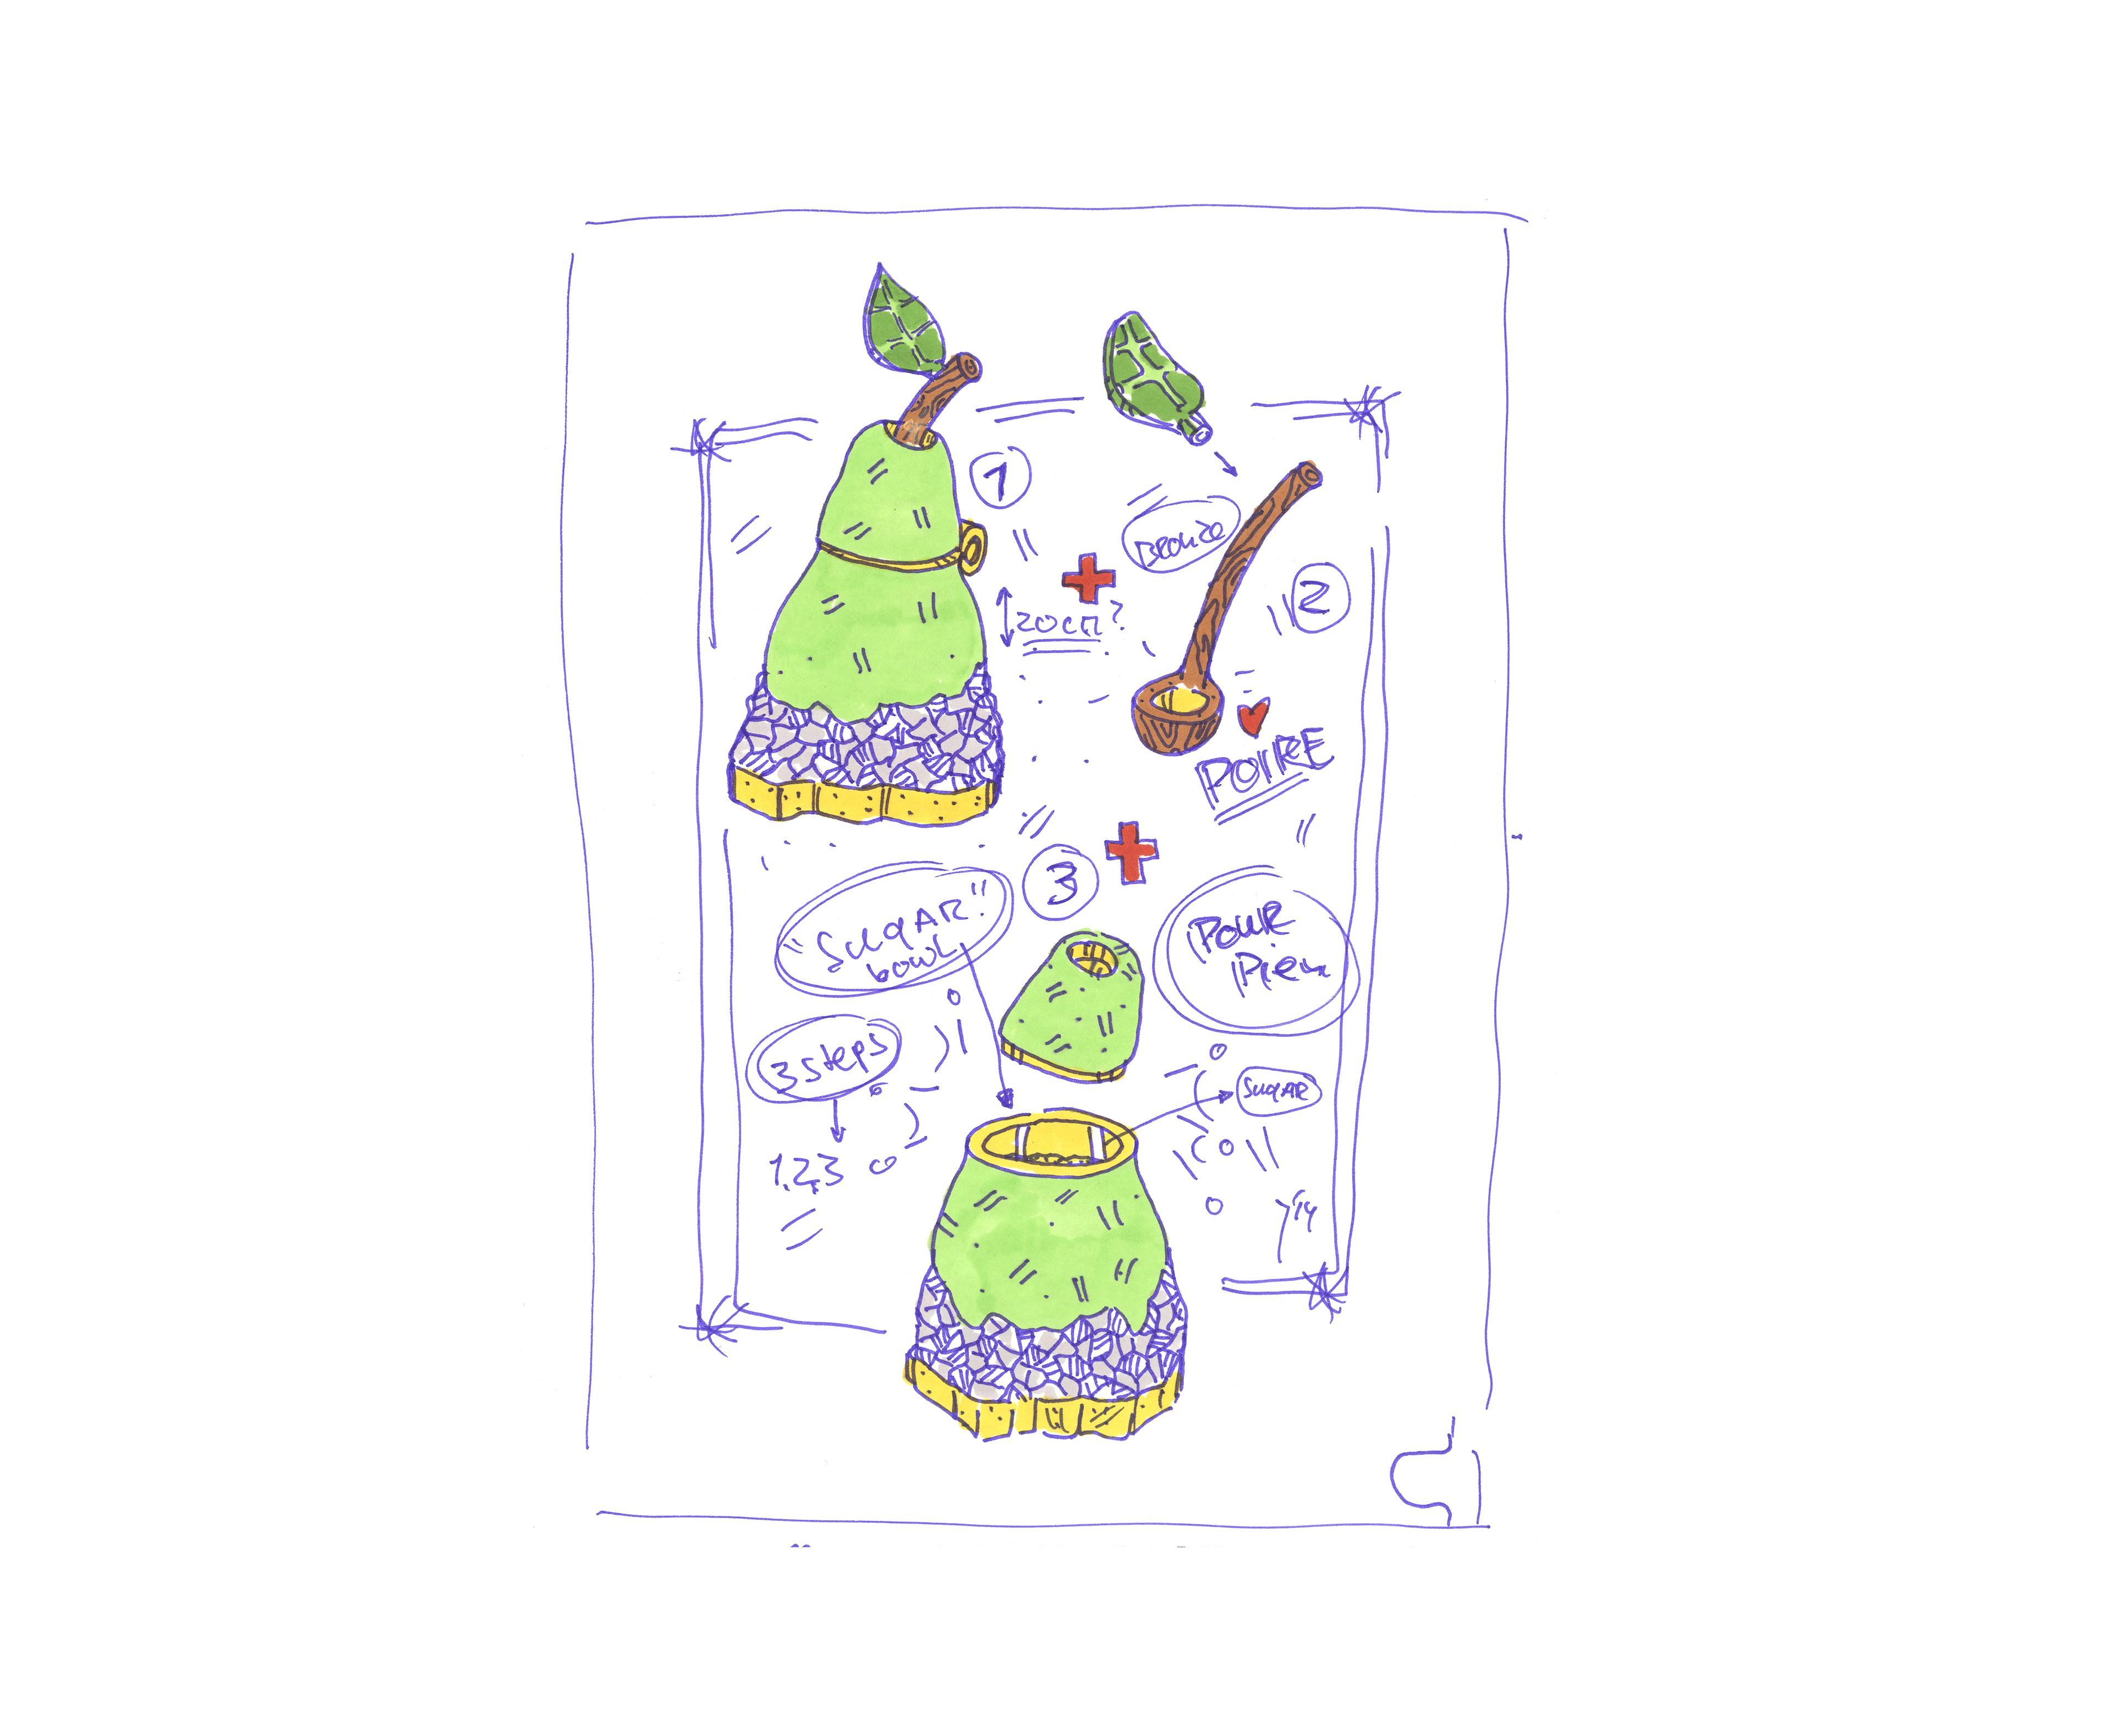 Studio-Job-Pear-Poire-drawing_950639_118